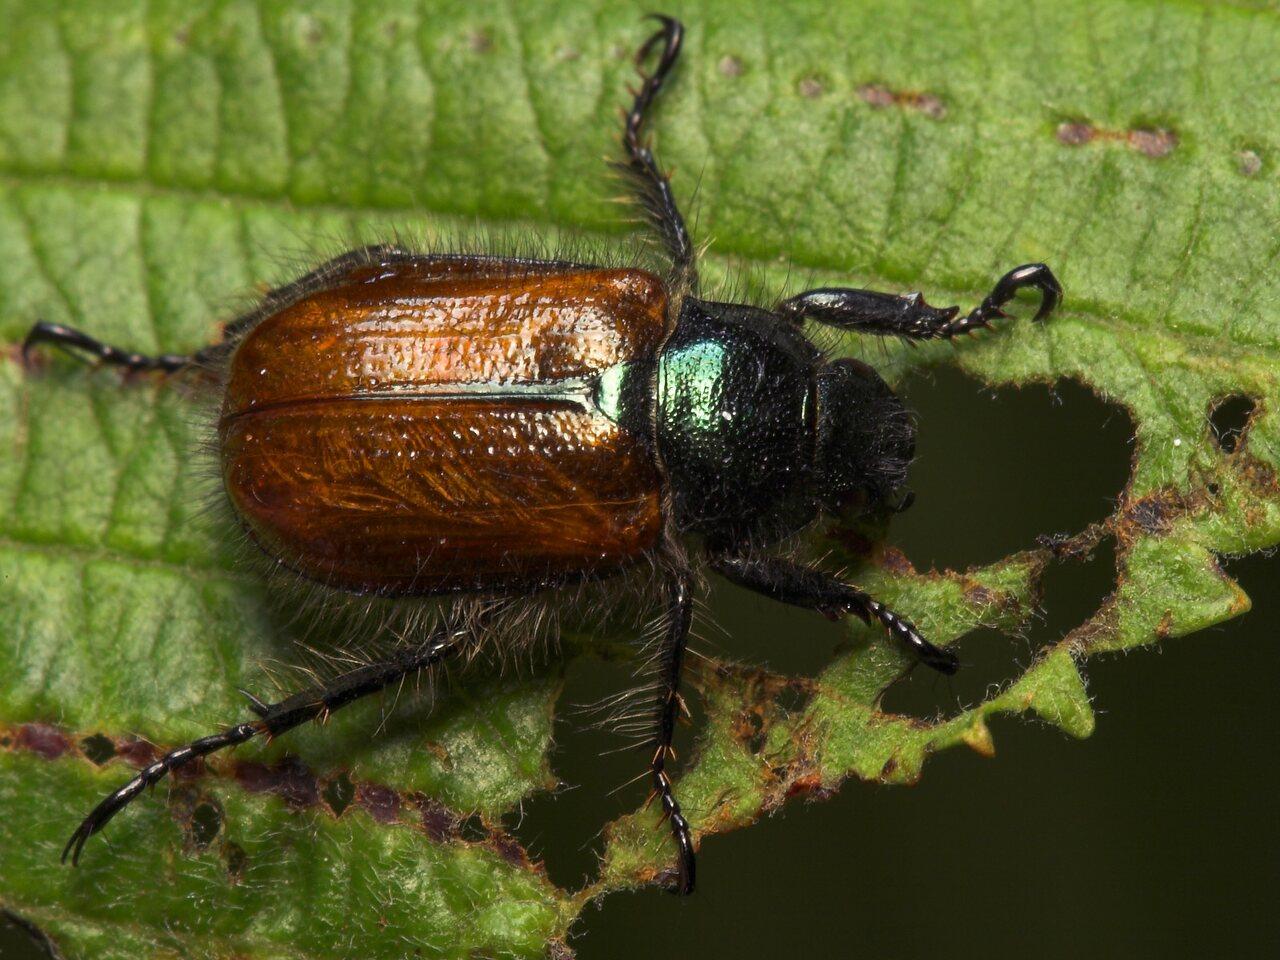 Phyllopertha-horticola-8047.jpg